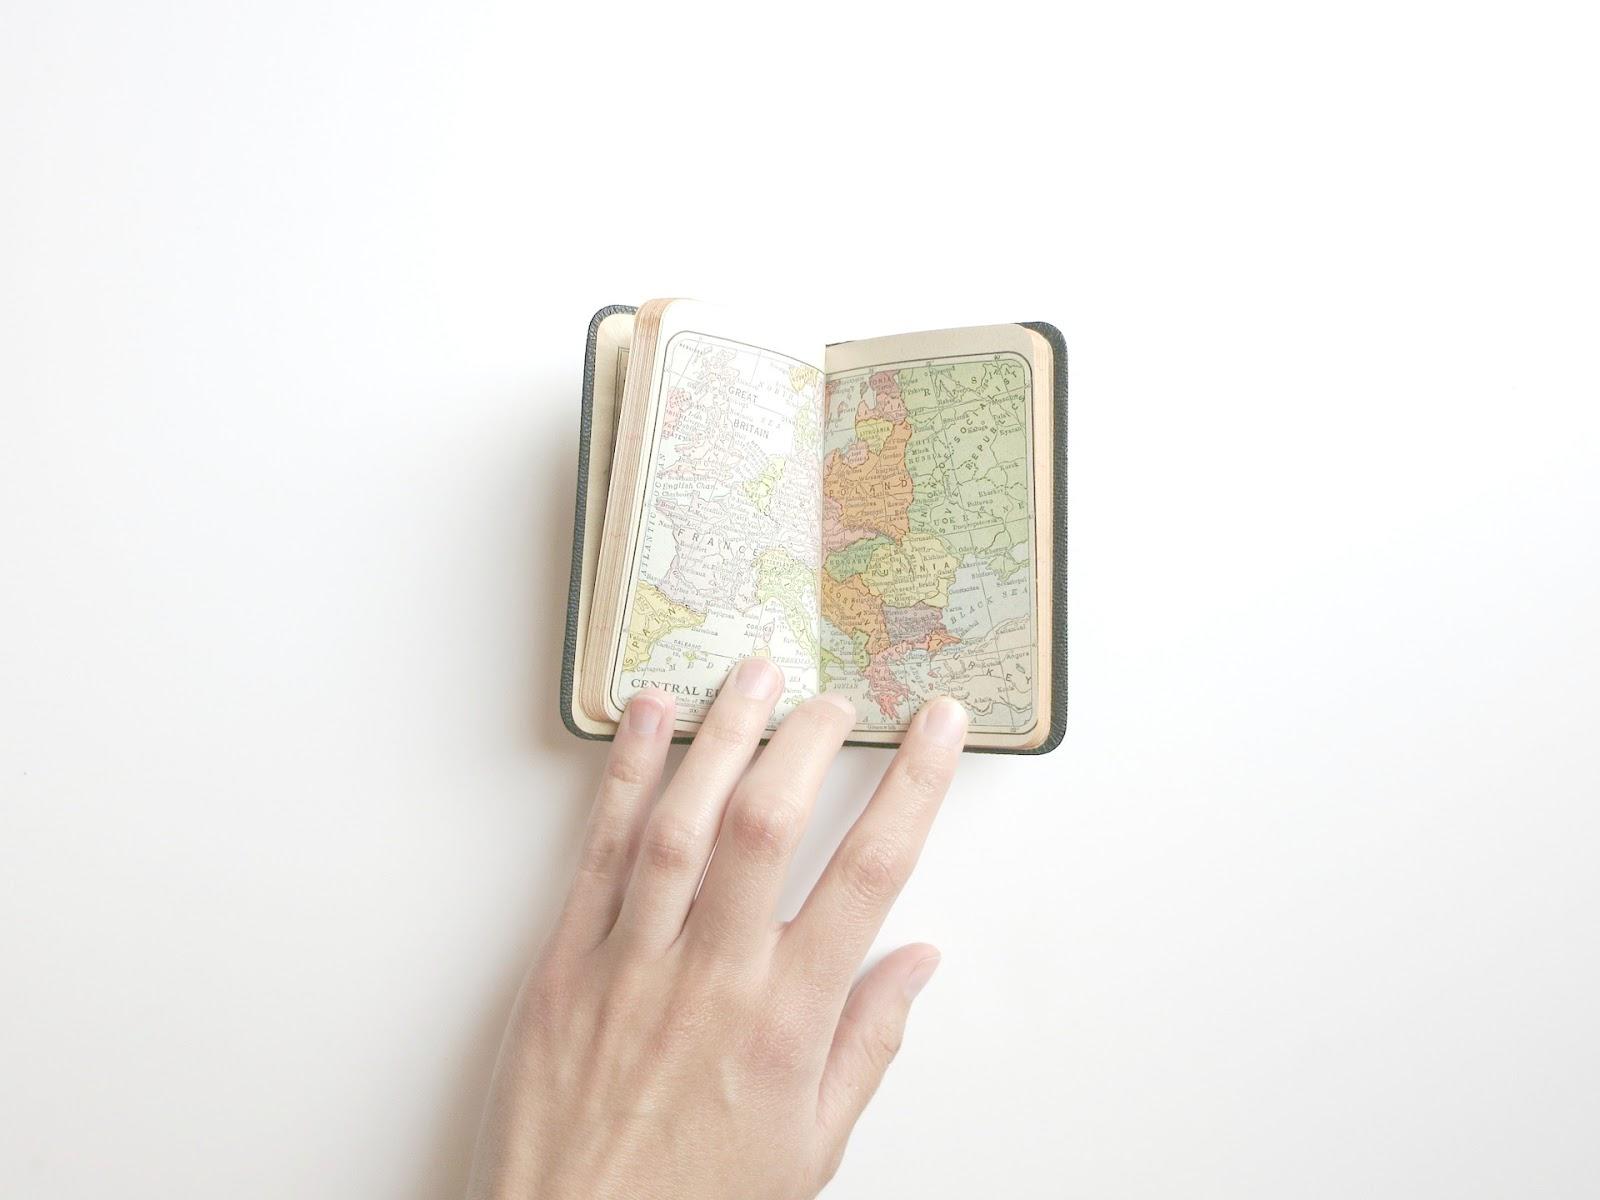 worldbuilding, world building, crear un mundo para tu historia, mundo para tu novela, cómo crear un mundo de fantasía, cómo crear un mundo de ciencia ficción, cómo escribir fantasía, cómo escribir ciencia ficción, qué es el worldbuilding, cómo empezar un mundo, novela, historia, escribir